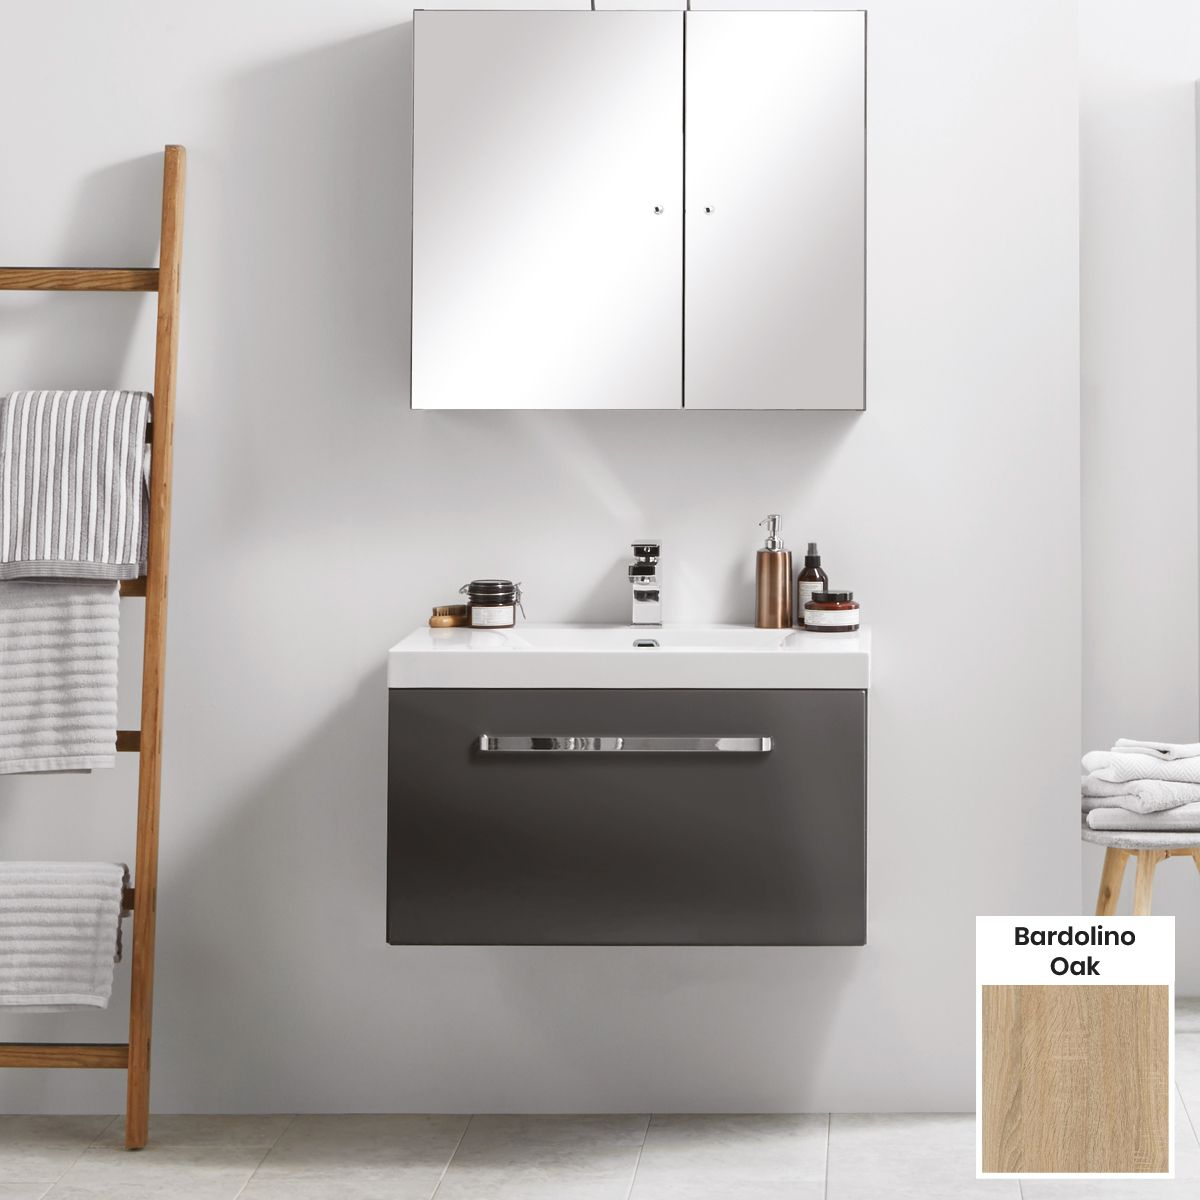 Elation Eko Bardolino Oak Vanity Unit with Groove Drawer 750mm